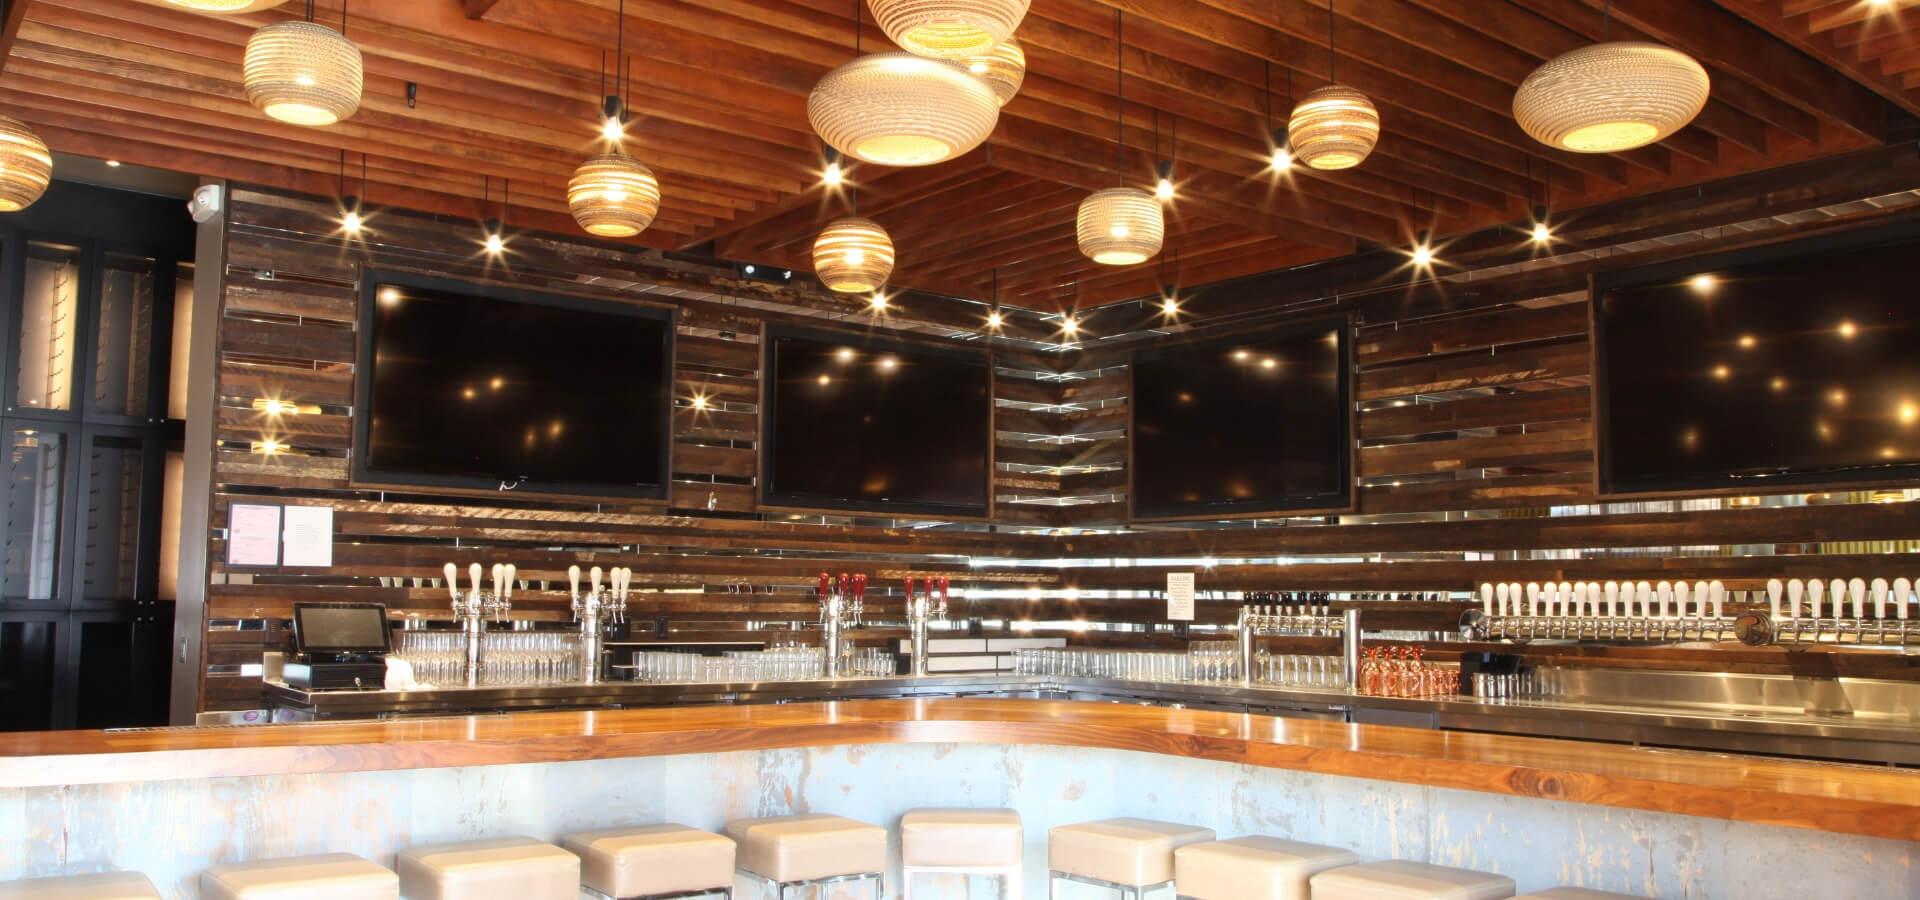 The Torsap Lounge